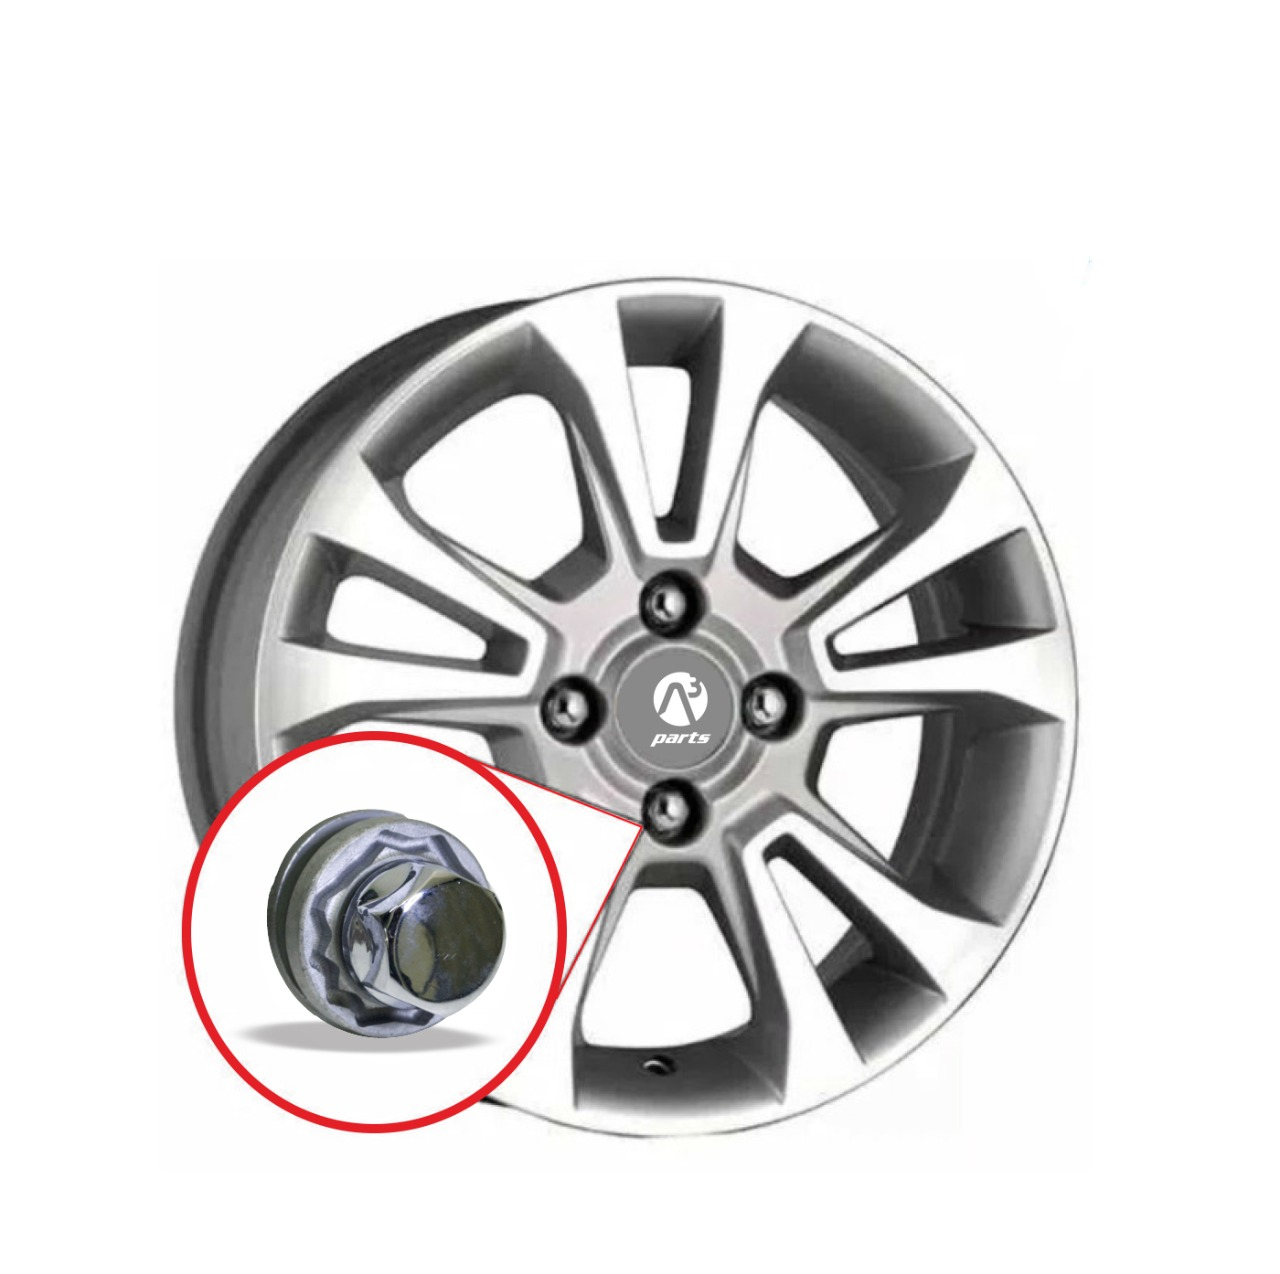 Kit Porca antifurto para rodas Galaxy Lock Toyota Lexus Lifan  382/M